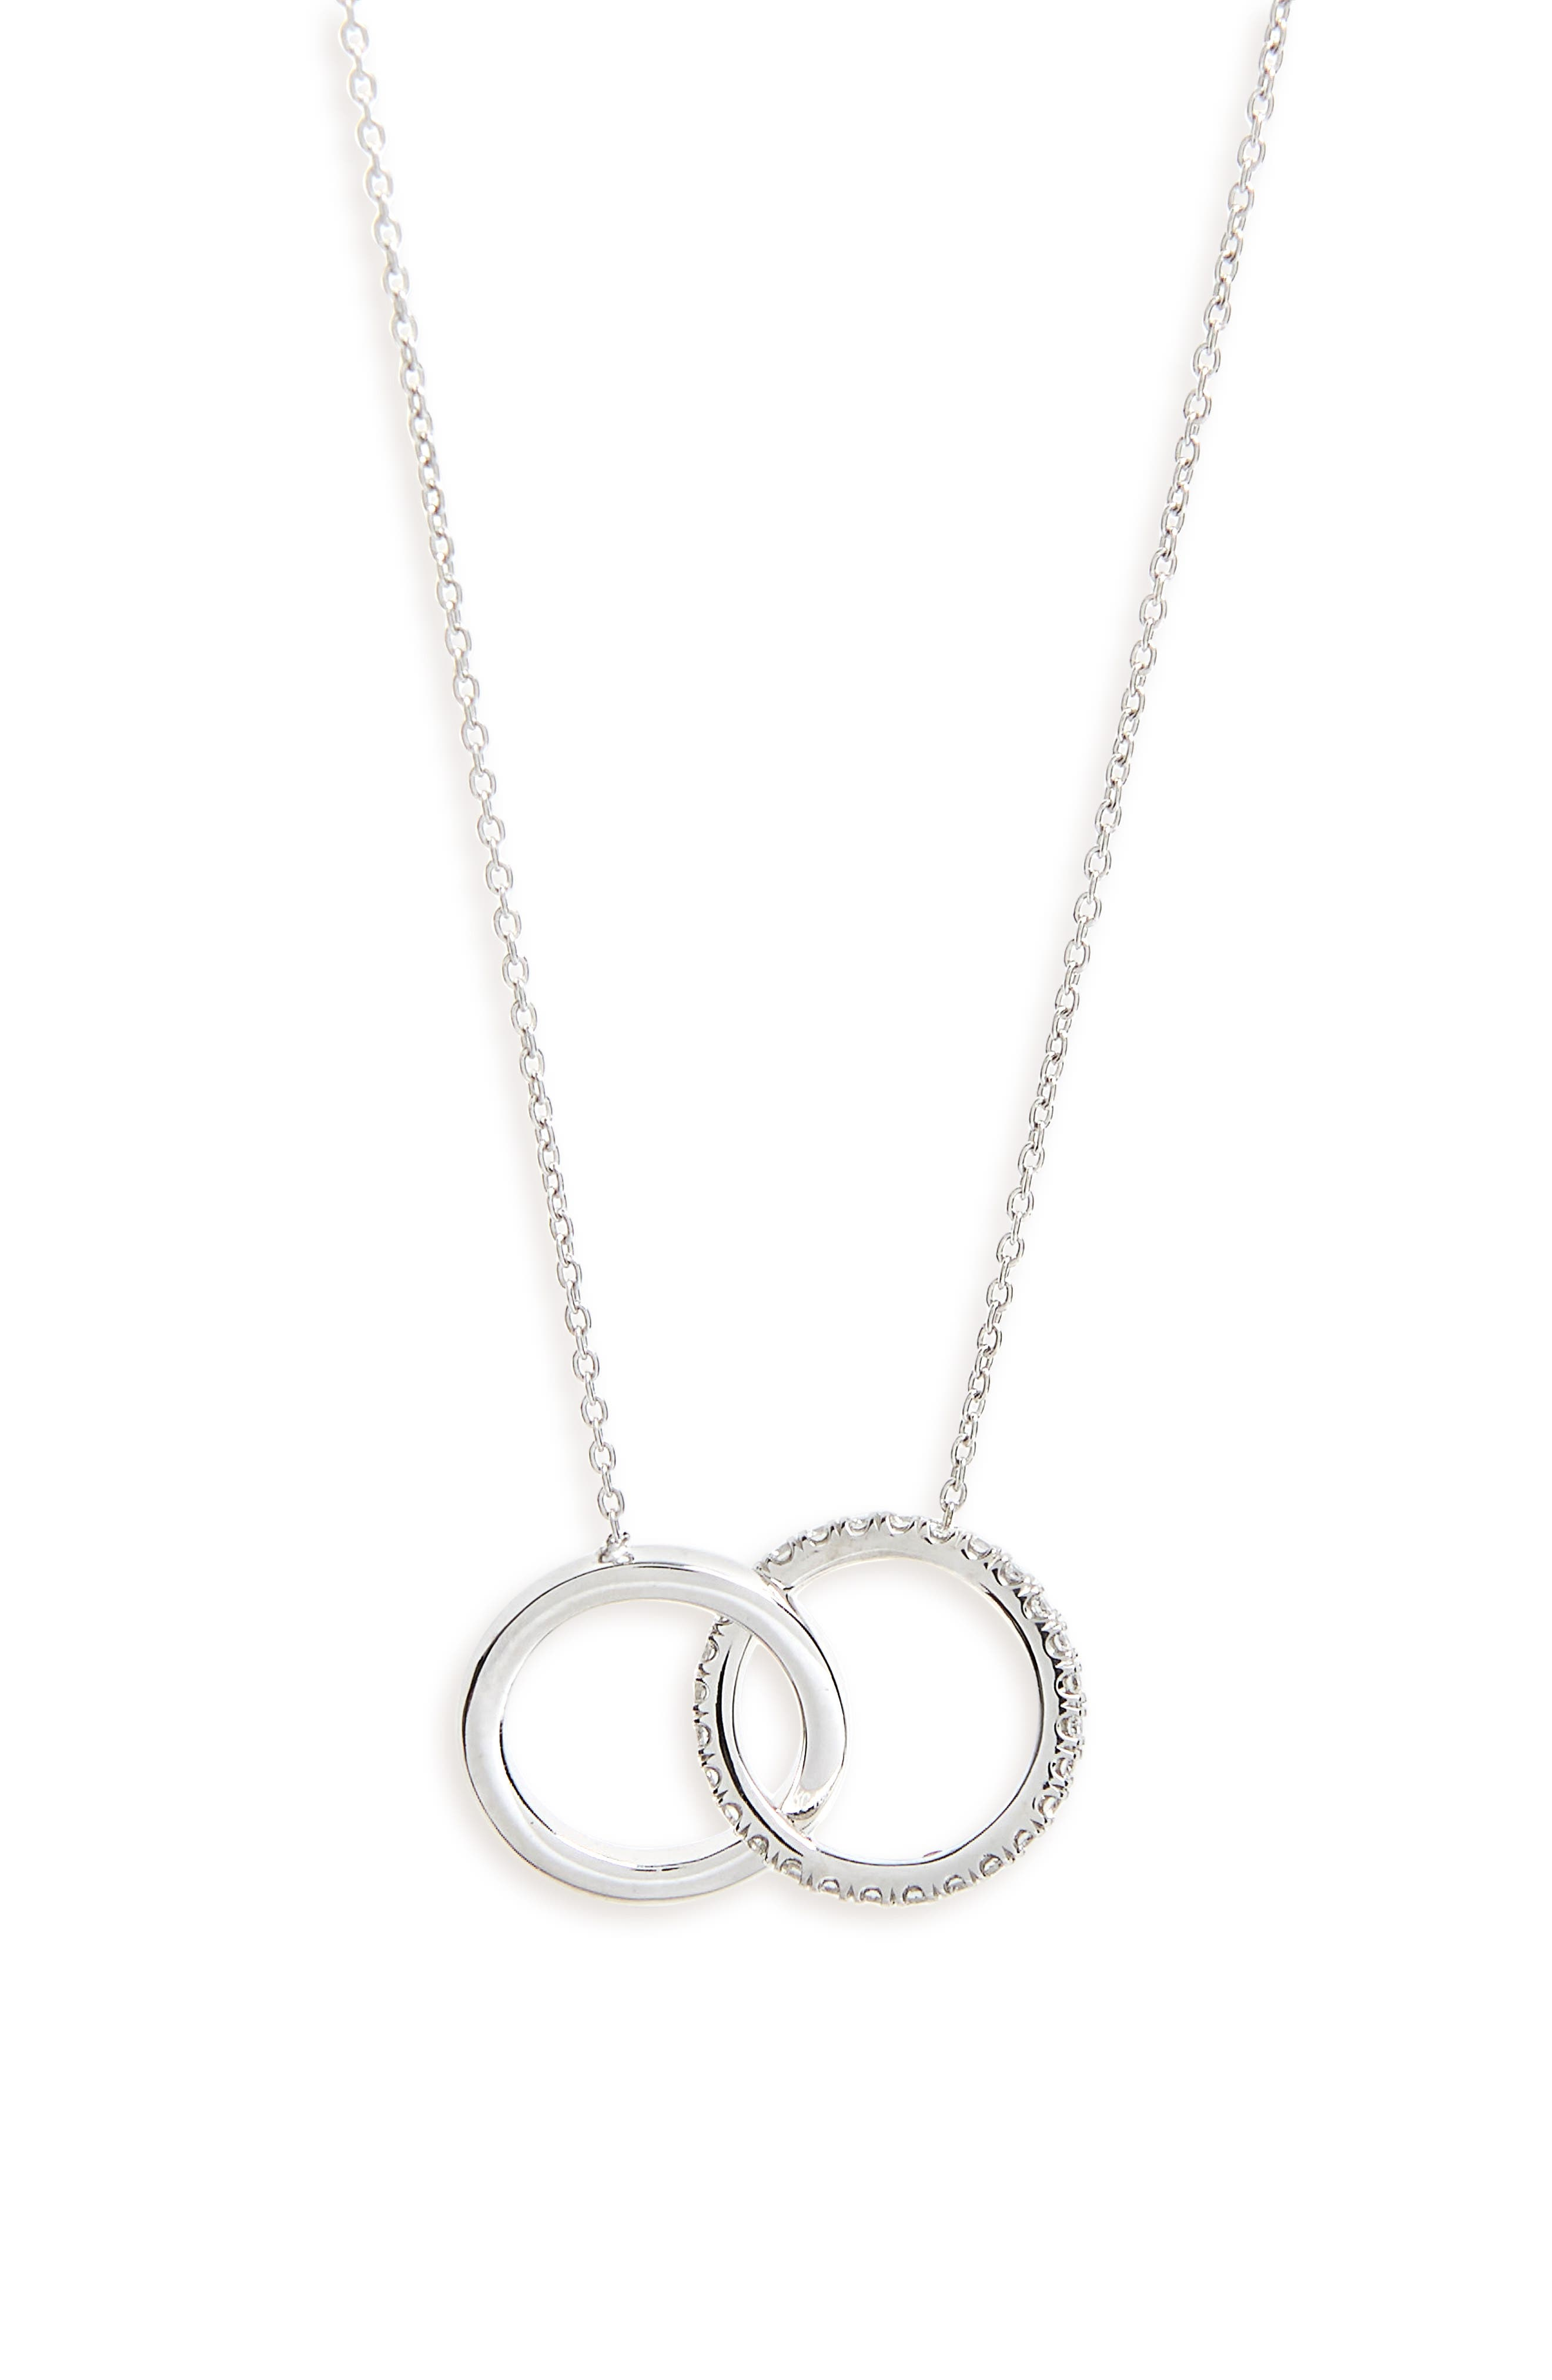 Diamond Double Circle Pendant Necklace,                             Main thumbnail 1, color,                             WHITE GOLD